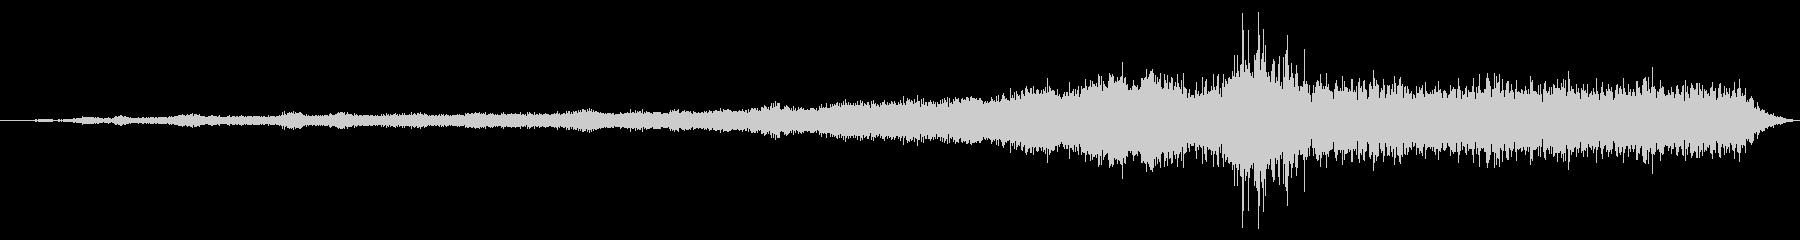 Ext:低速で左にアプローチ、停止...の未再生の波形